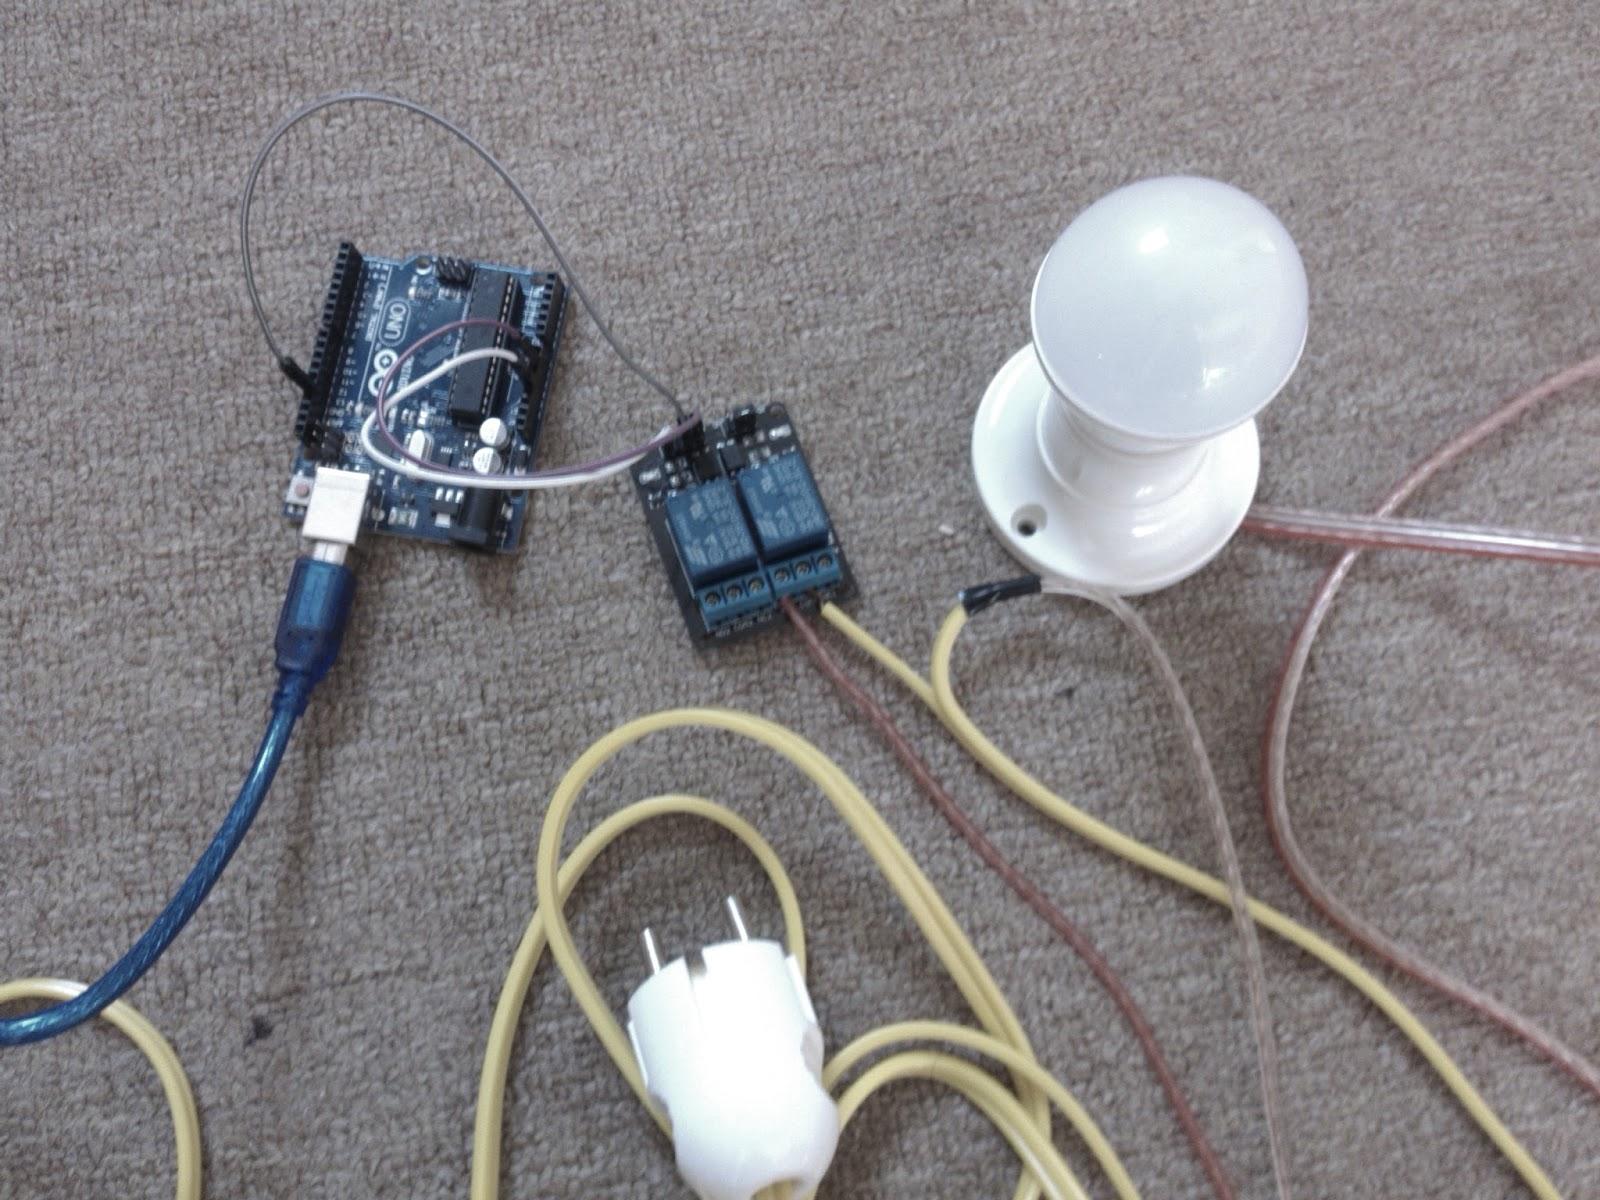 Project Arduino Menyalakan Lampu Rumah Ac Menggunakan Wiring Sumber Gambar Galeri Pribadi